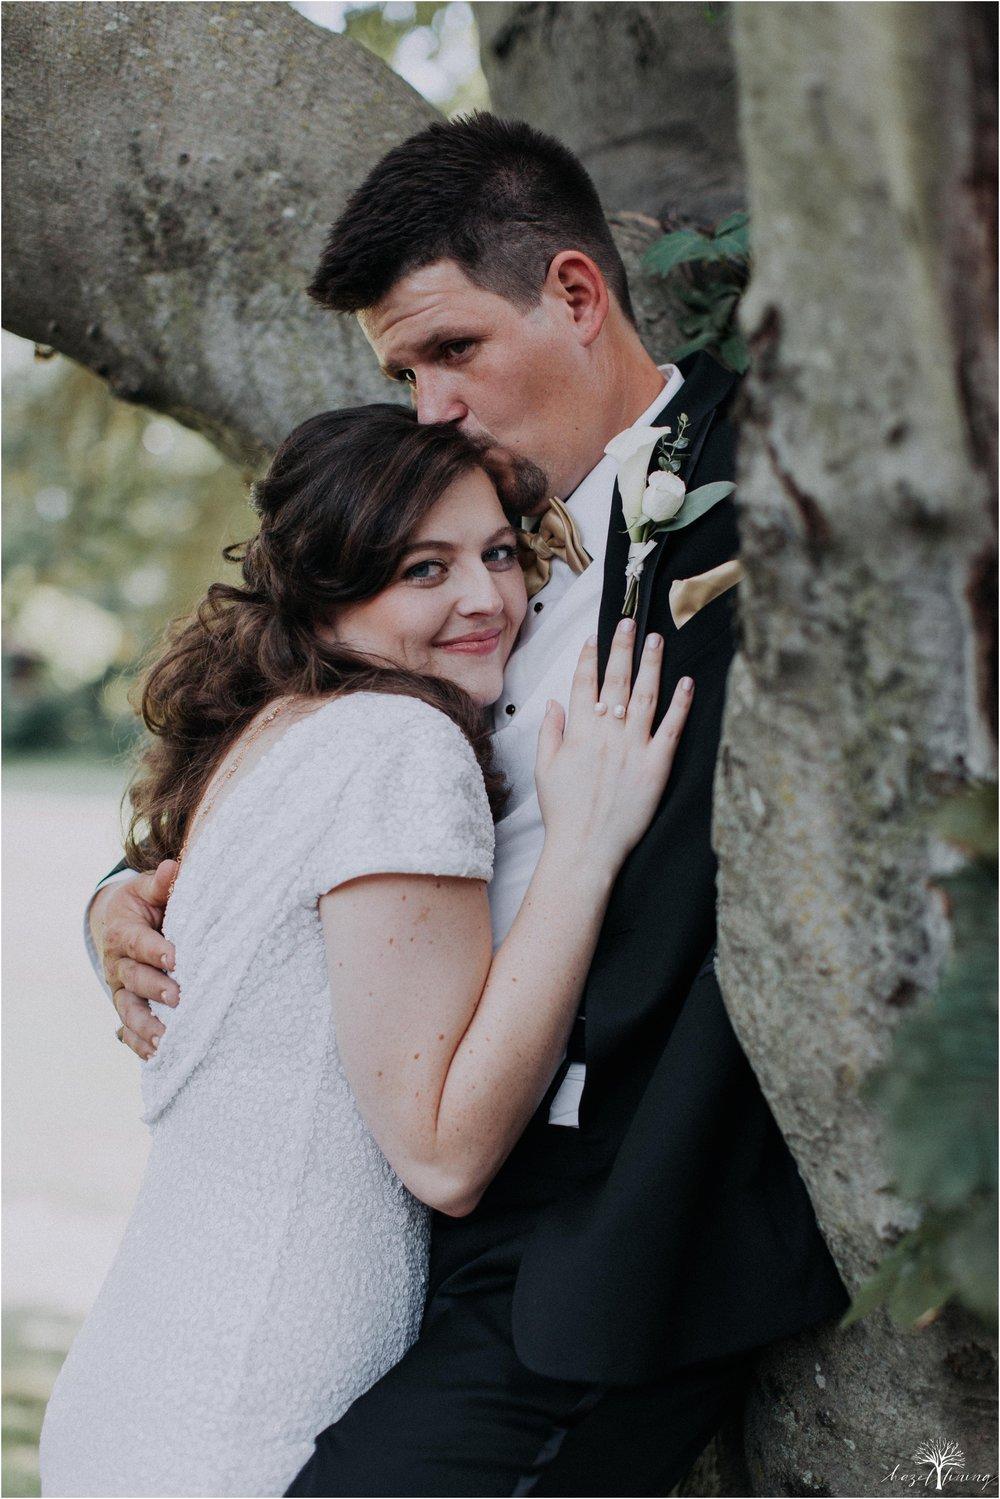 elizabeth-doelp-andrew-foreback-middletown-country-club-summer-langhorne-pennsylvania-wedding-hazel-lining-travel-wedding-elopement-photography_0094.jpg